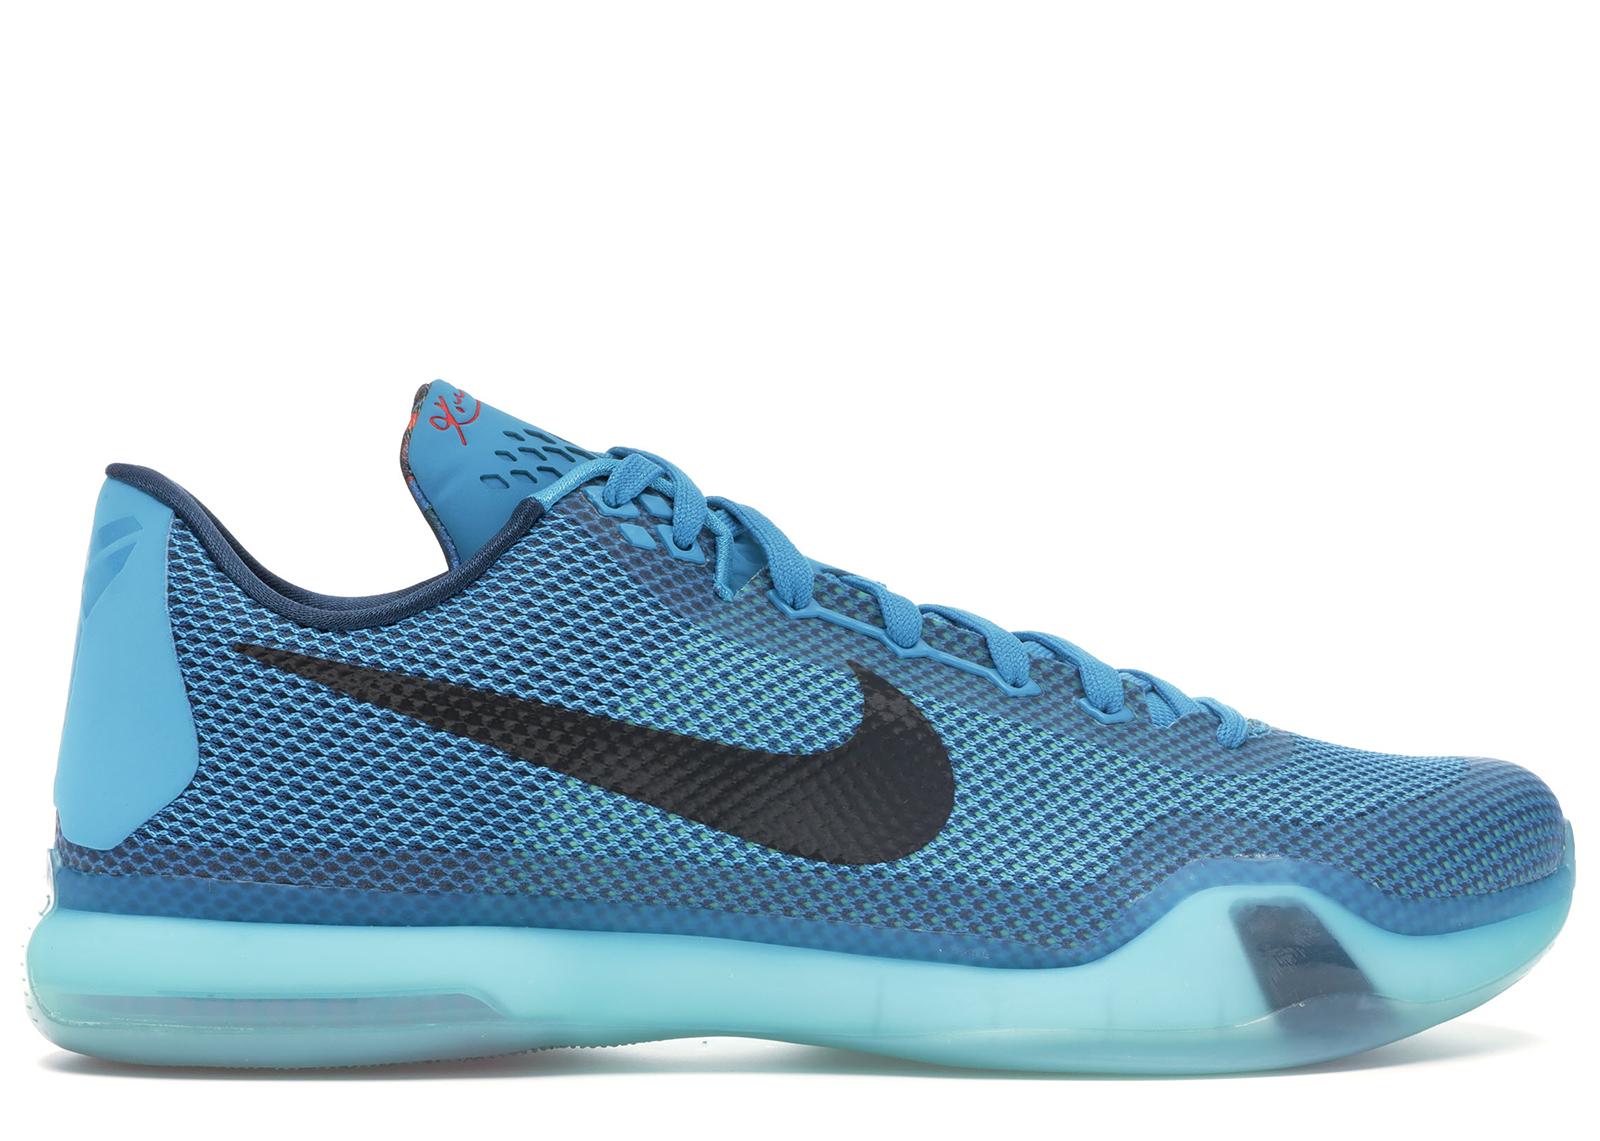 Nike Kobe 10 5AM Flight - 705317-403